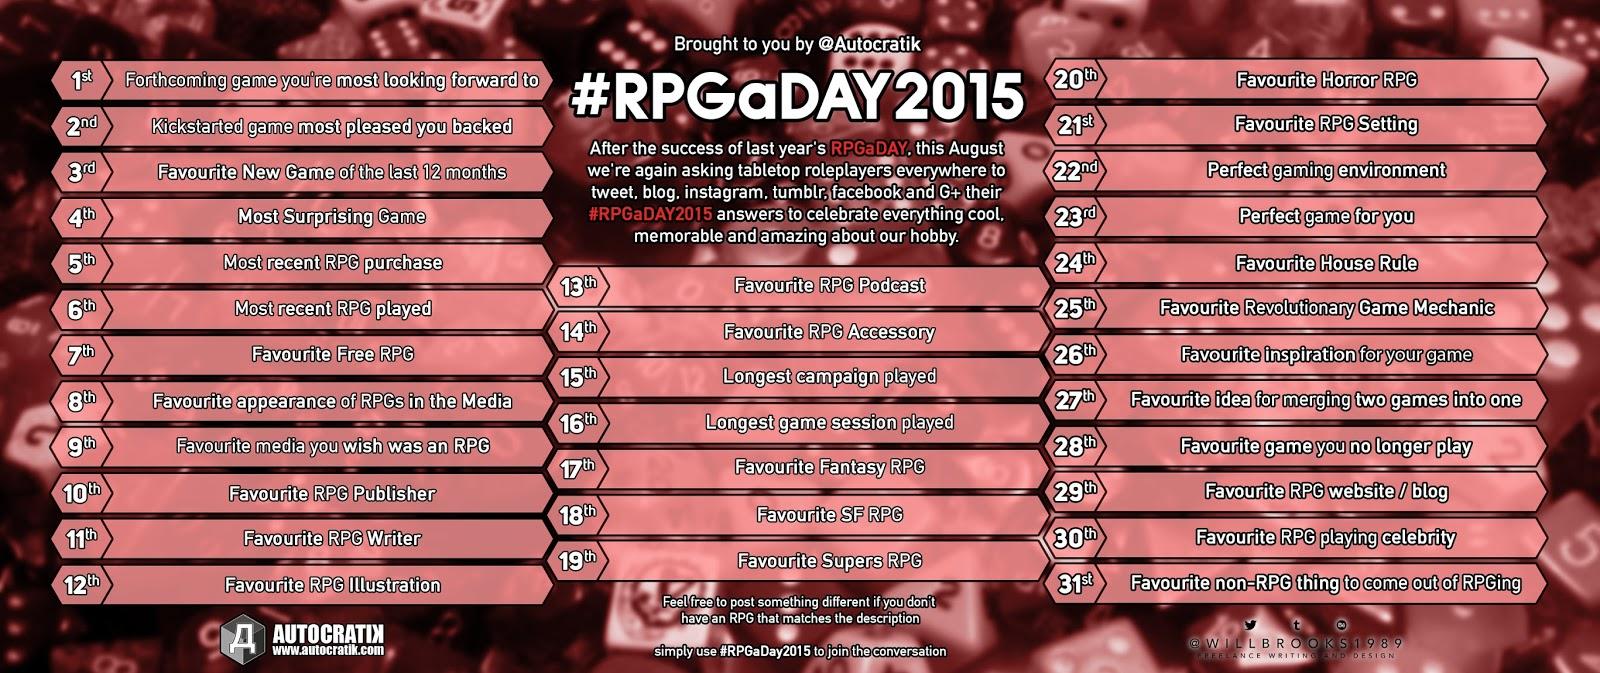 rpgaday2015 topics